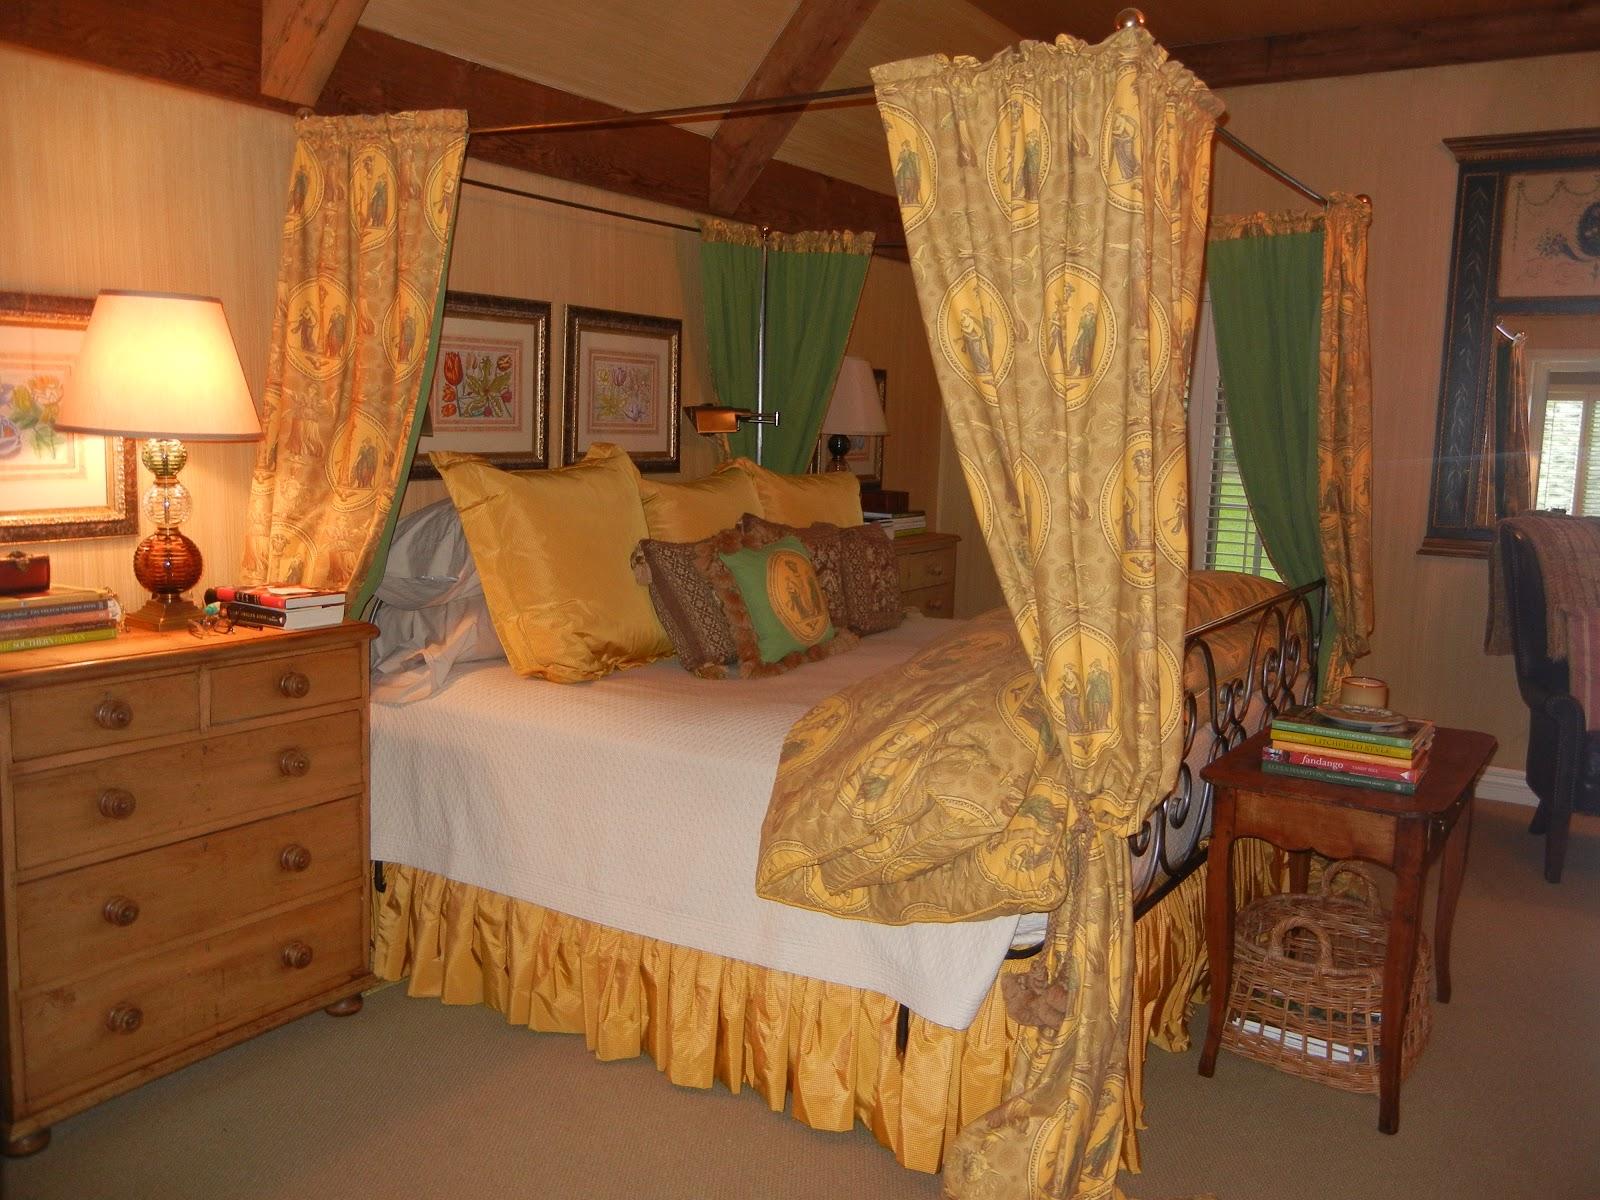 The French Tangerine Master Bedroom Change